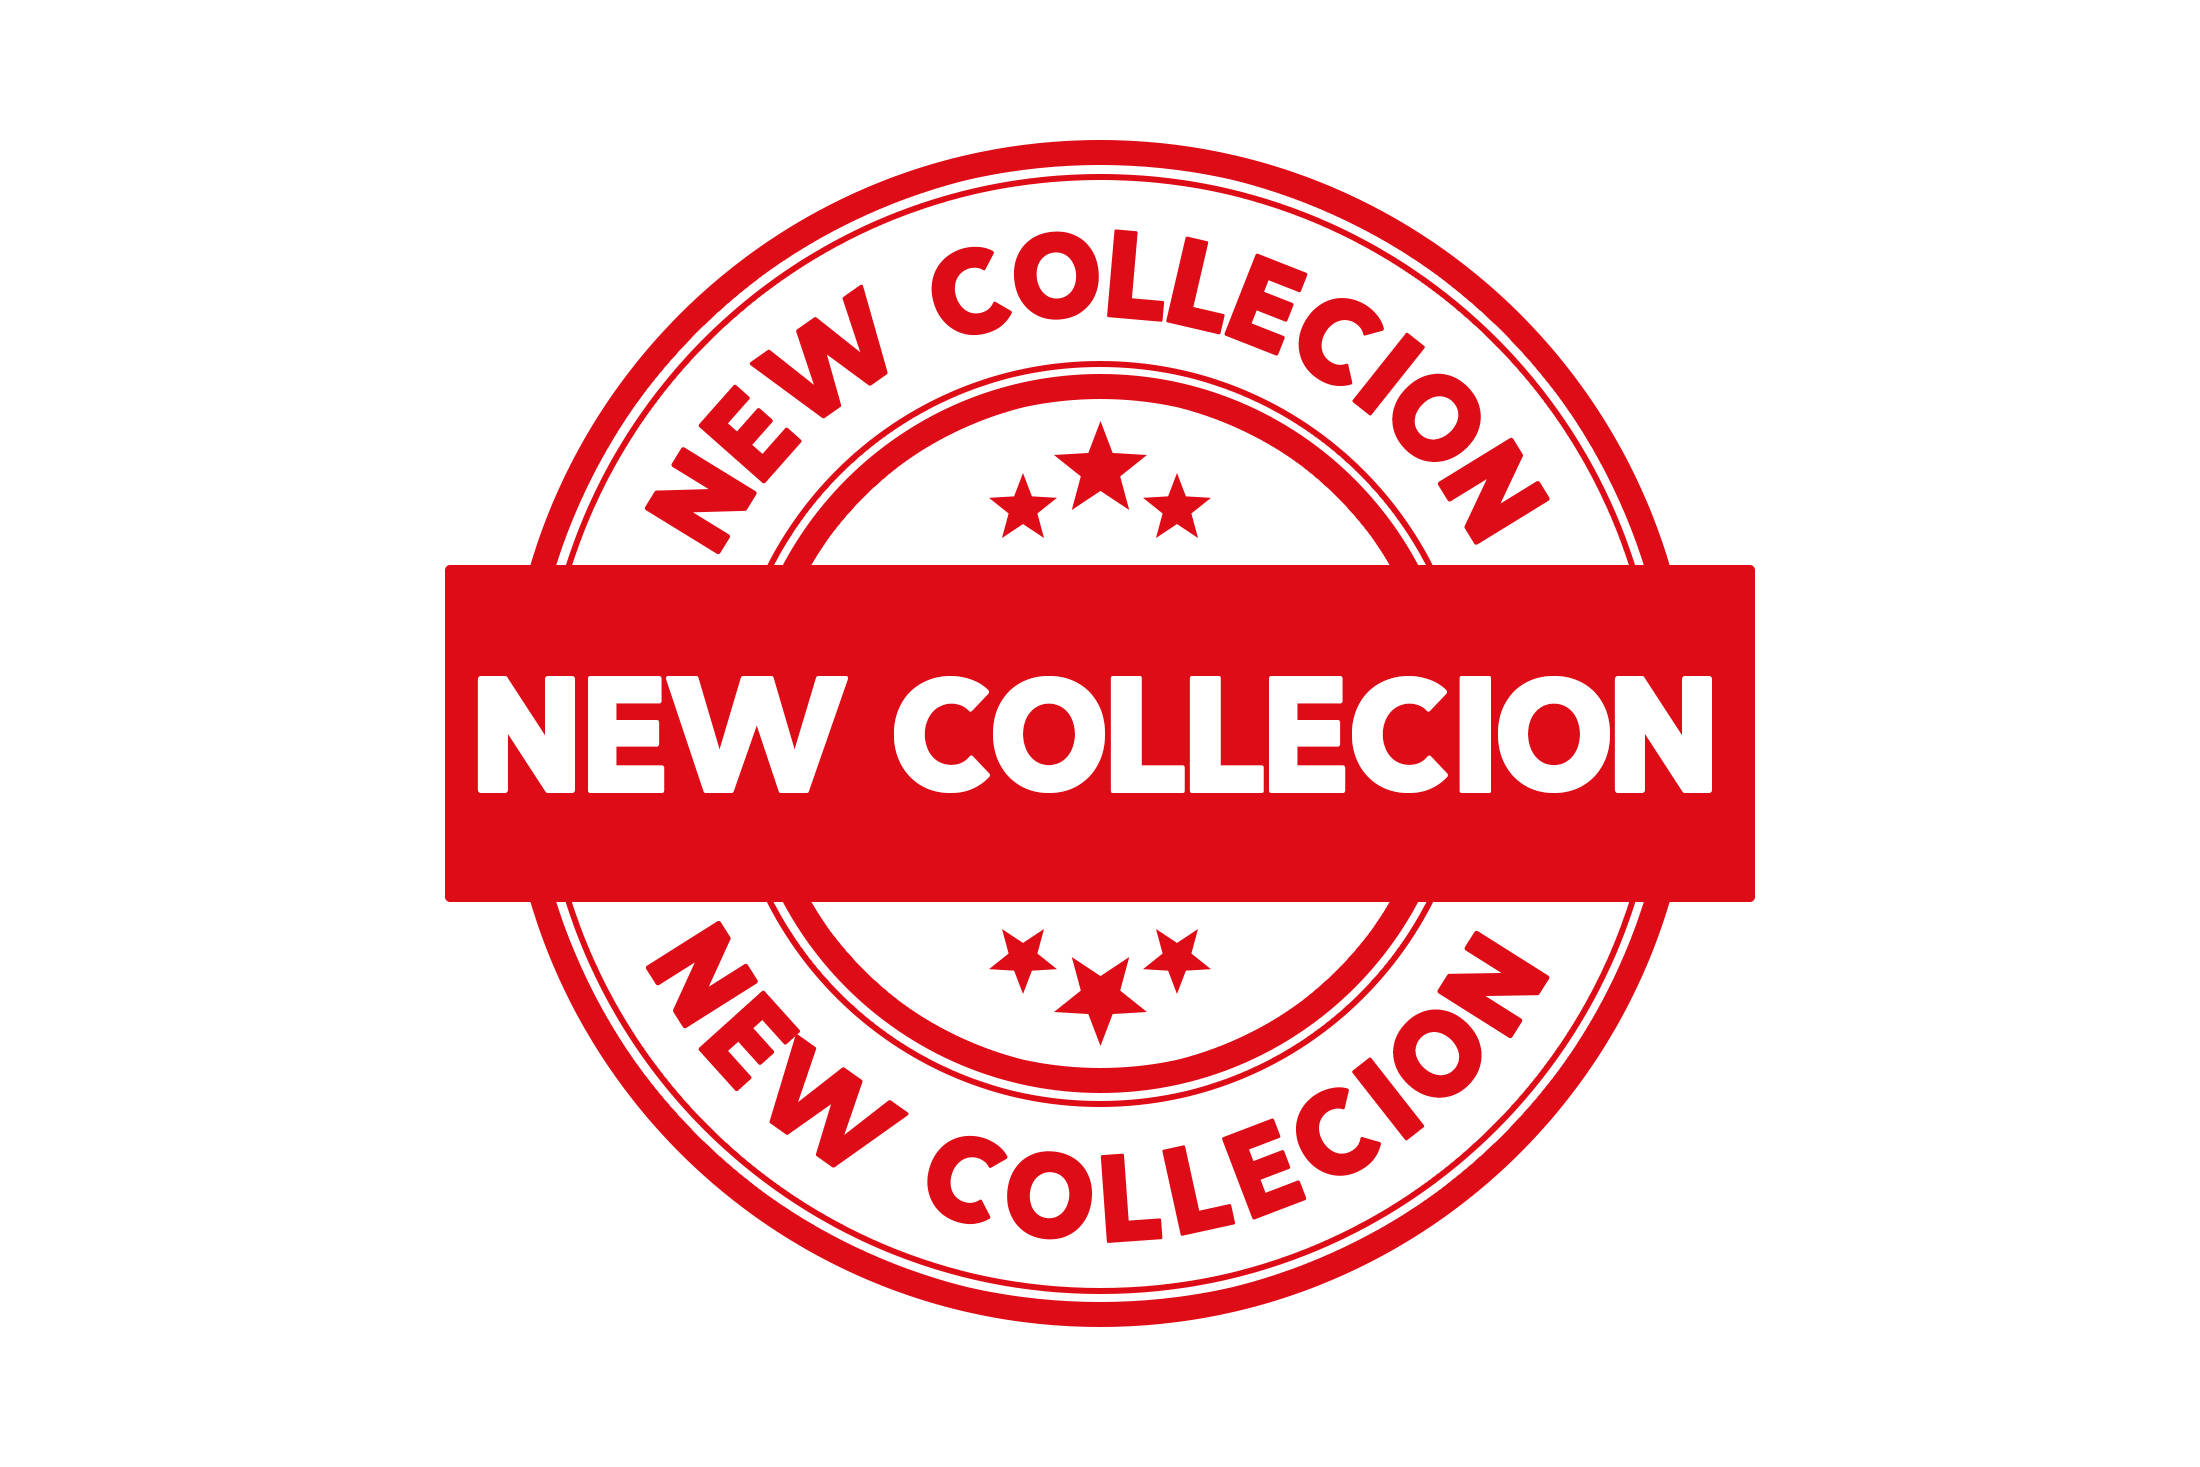 Round new collecion stamp PSD